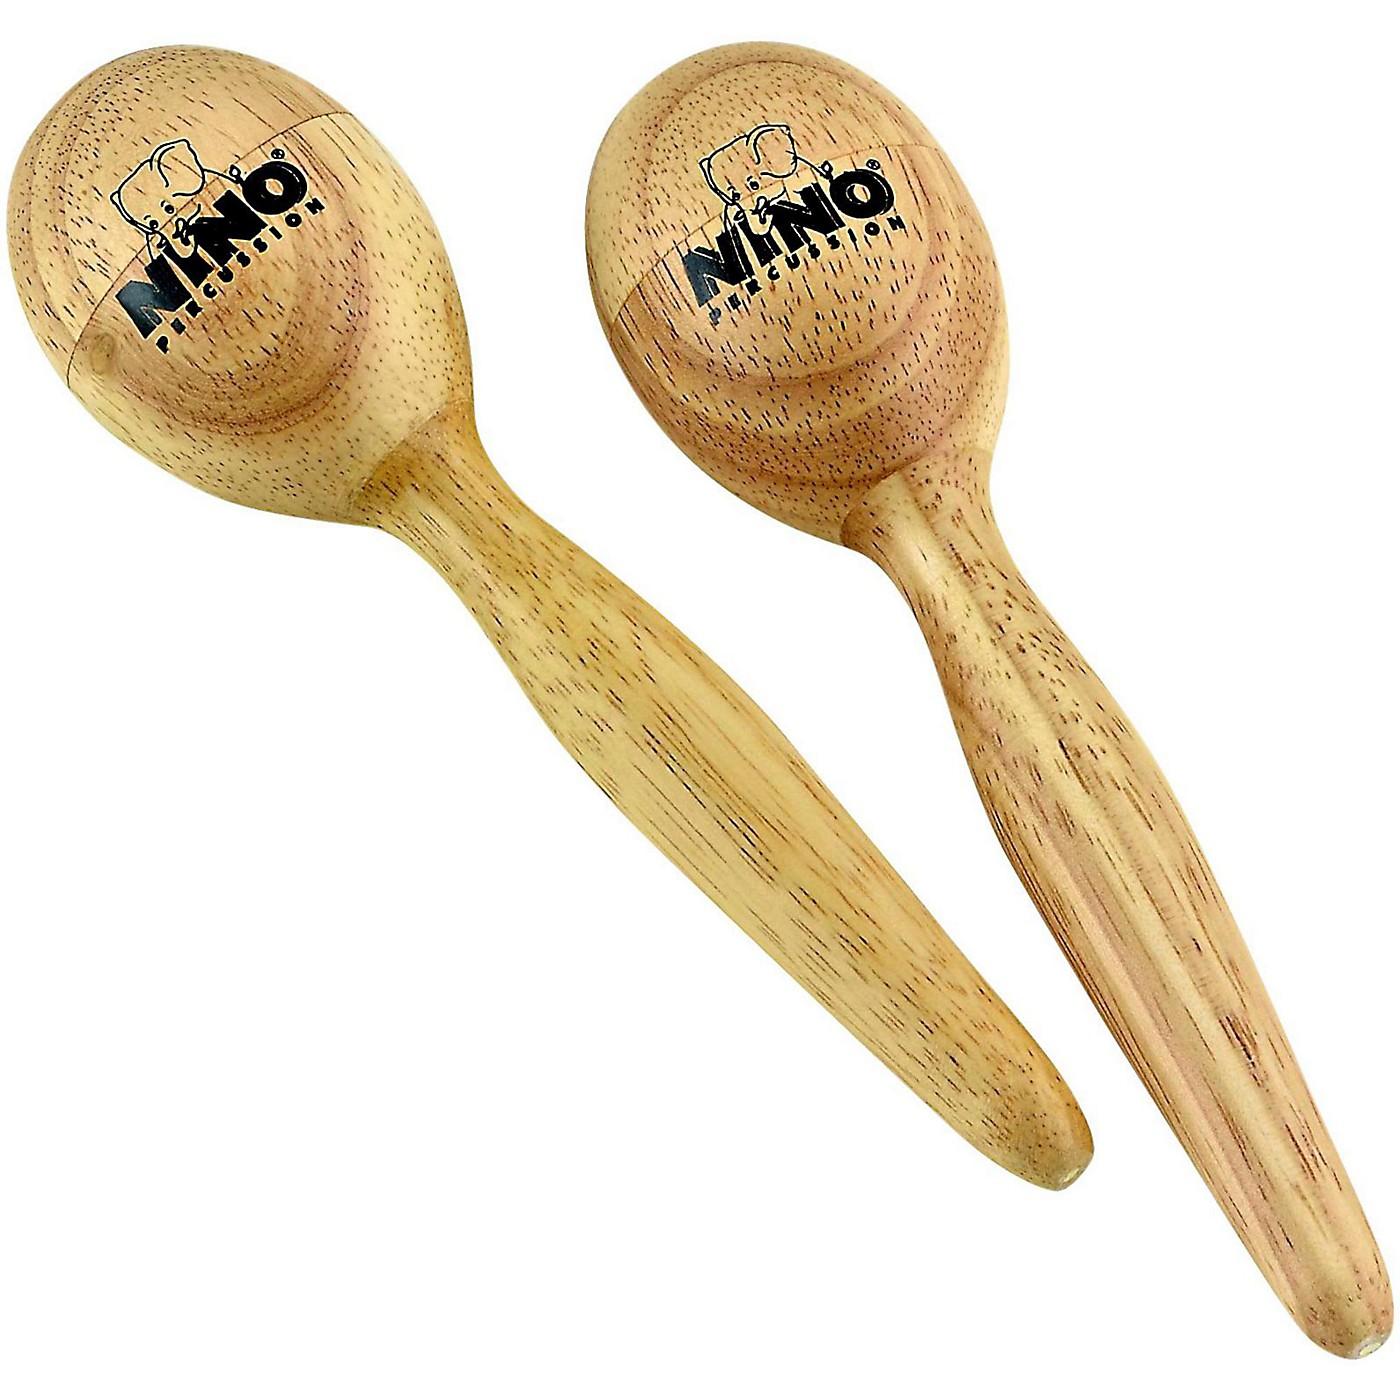 Nino Wood Egg Maracas/Pair thumbnail